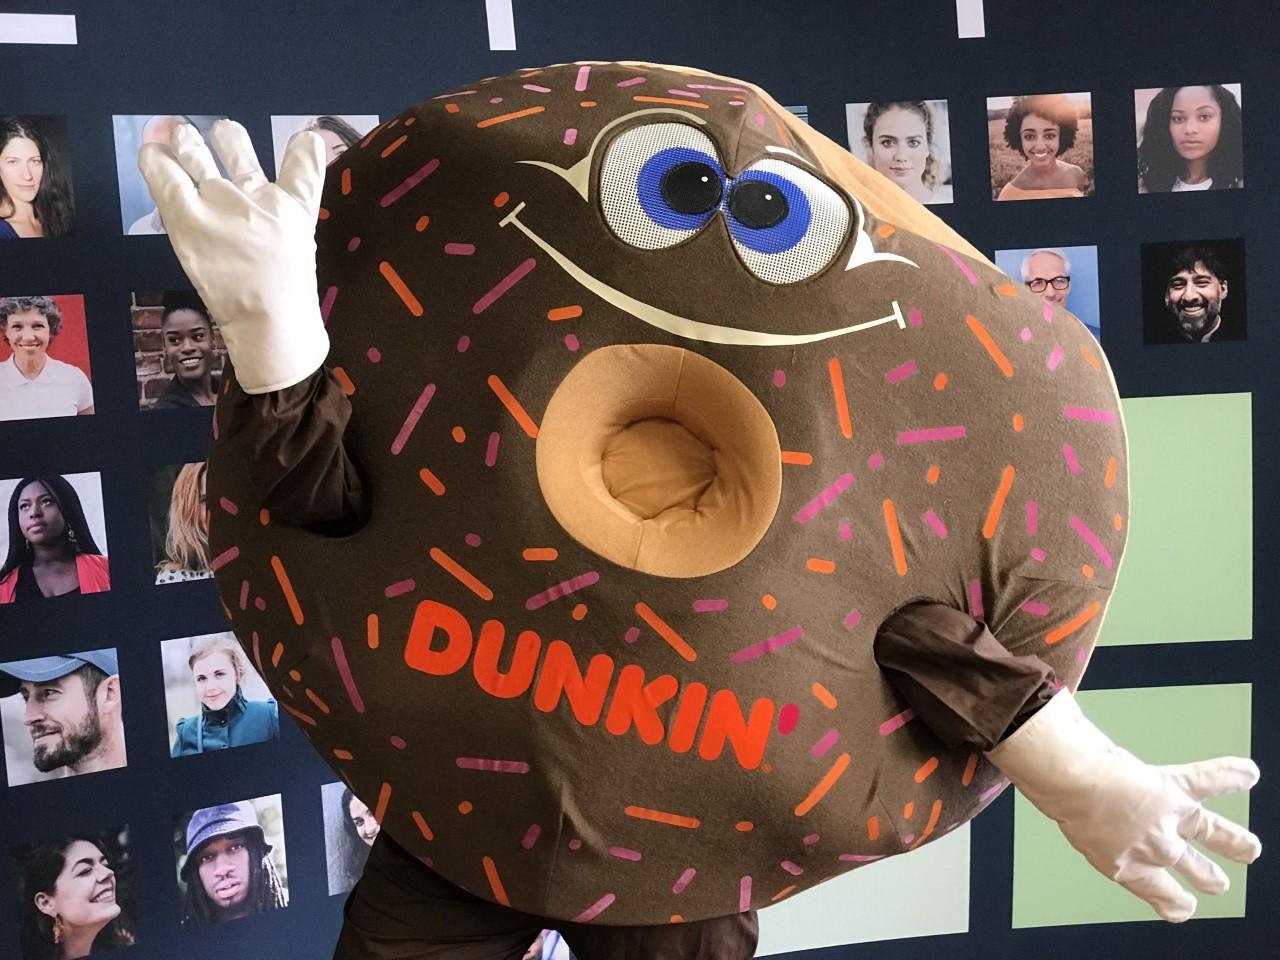 Bluemont Group Dunkin' Mascot at a Hiring Fair